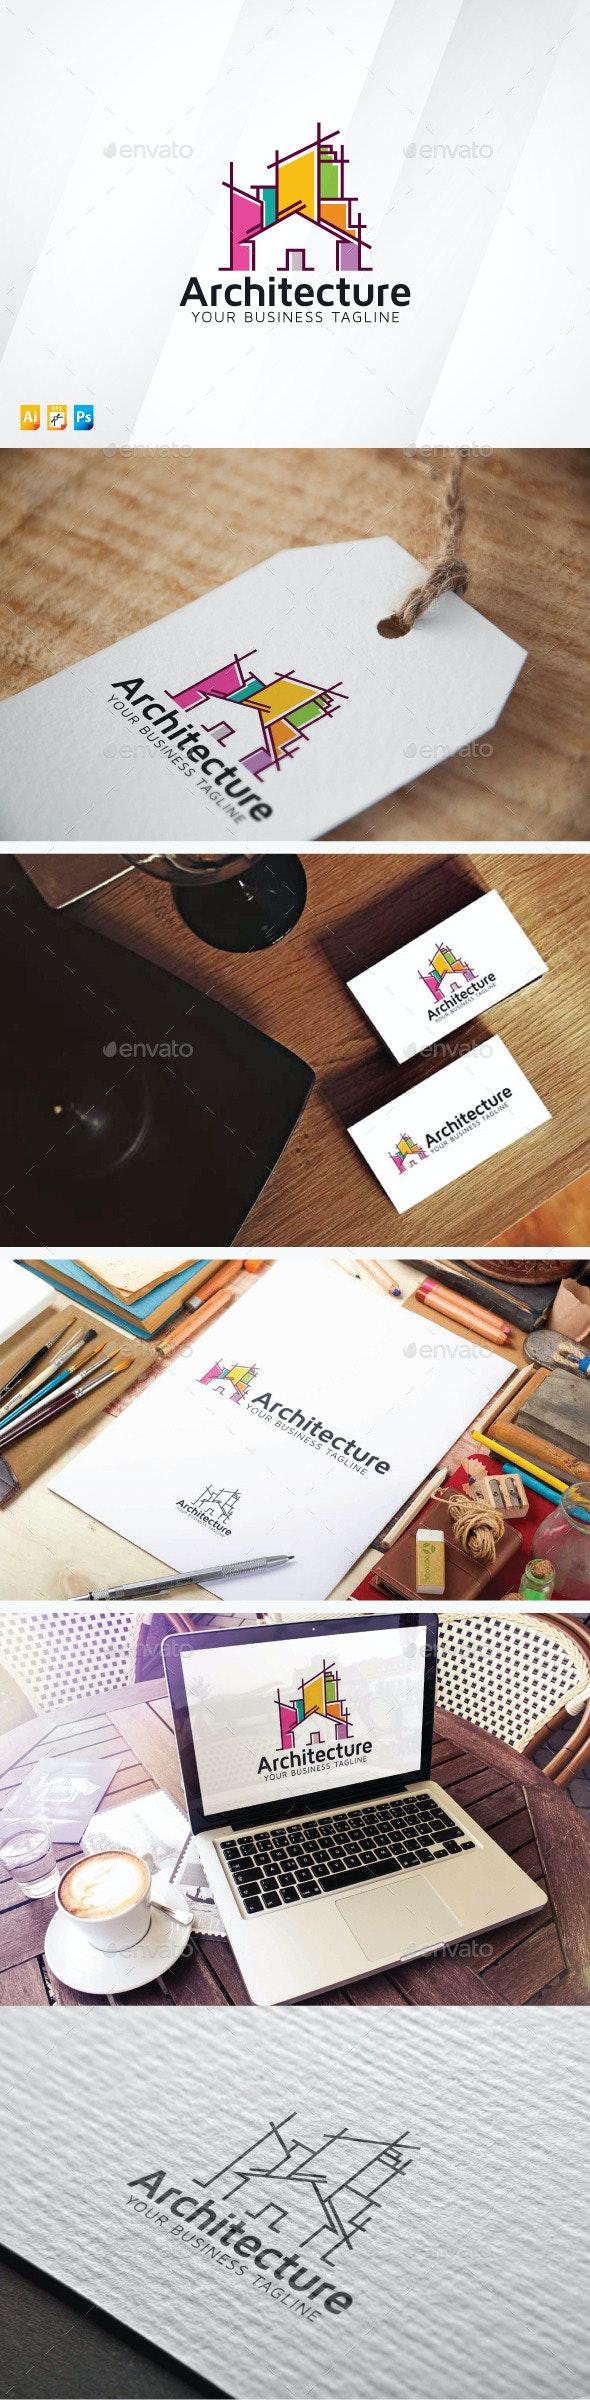 Architecture Logo - Buildings Logo Templates